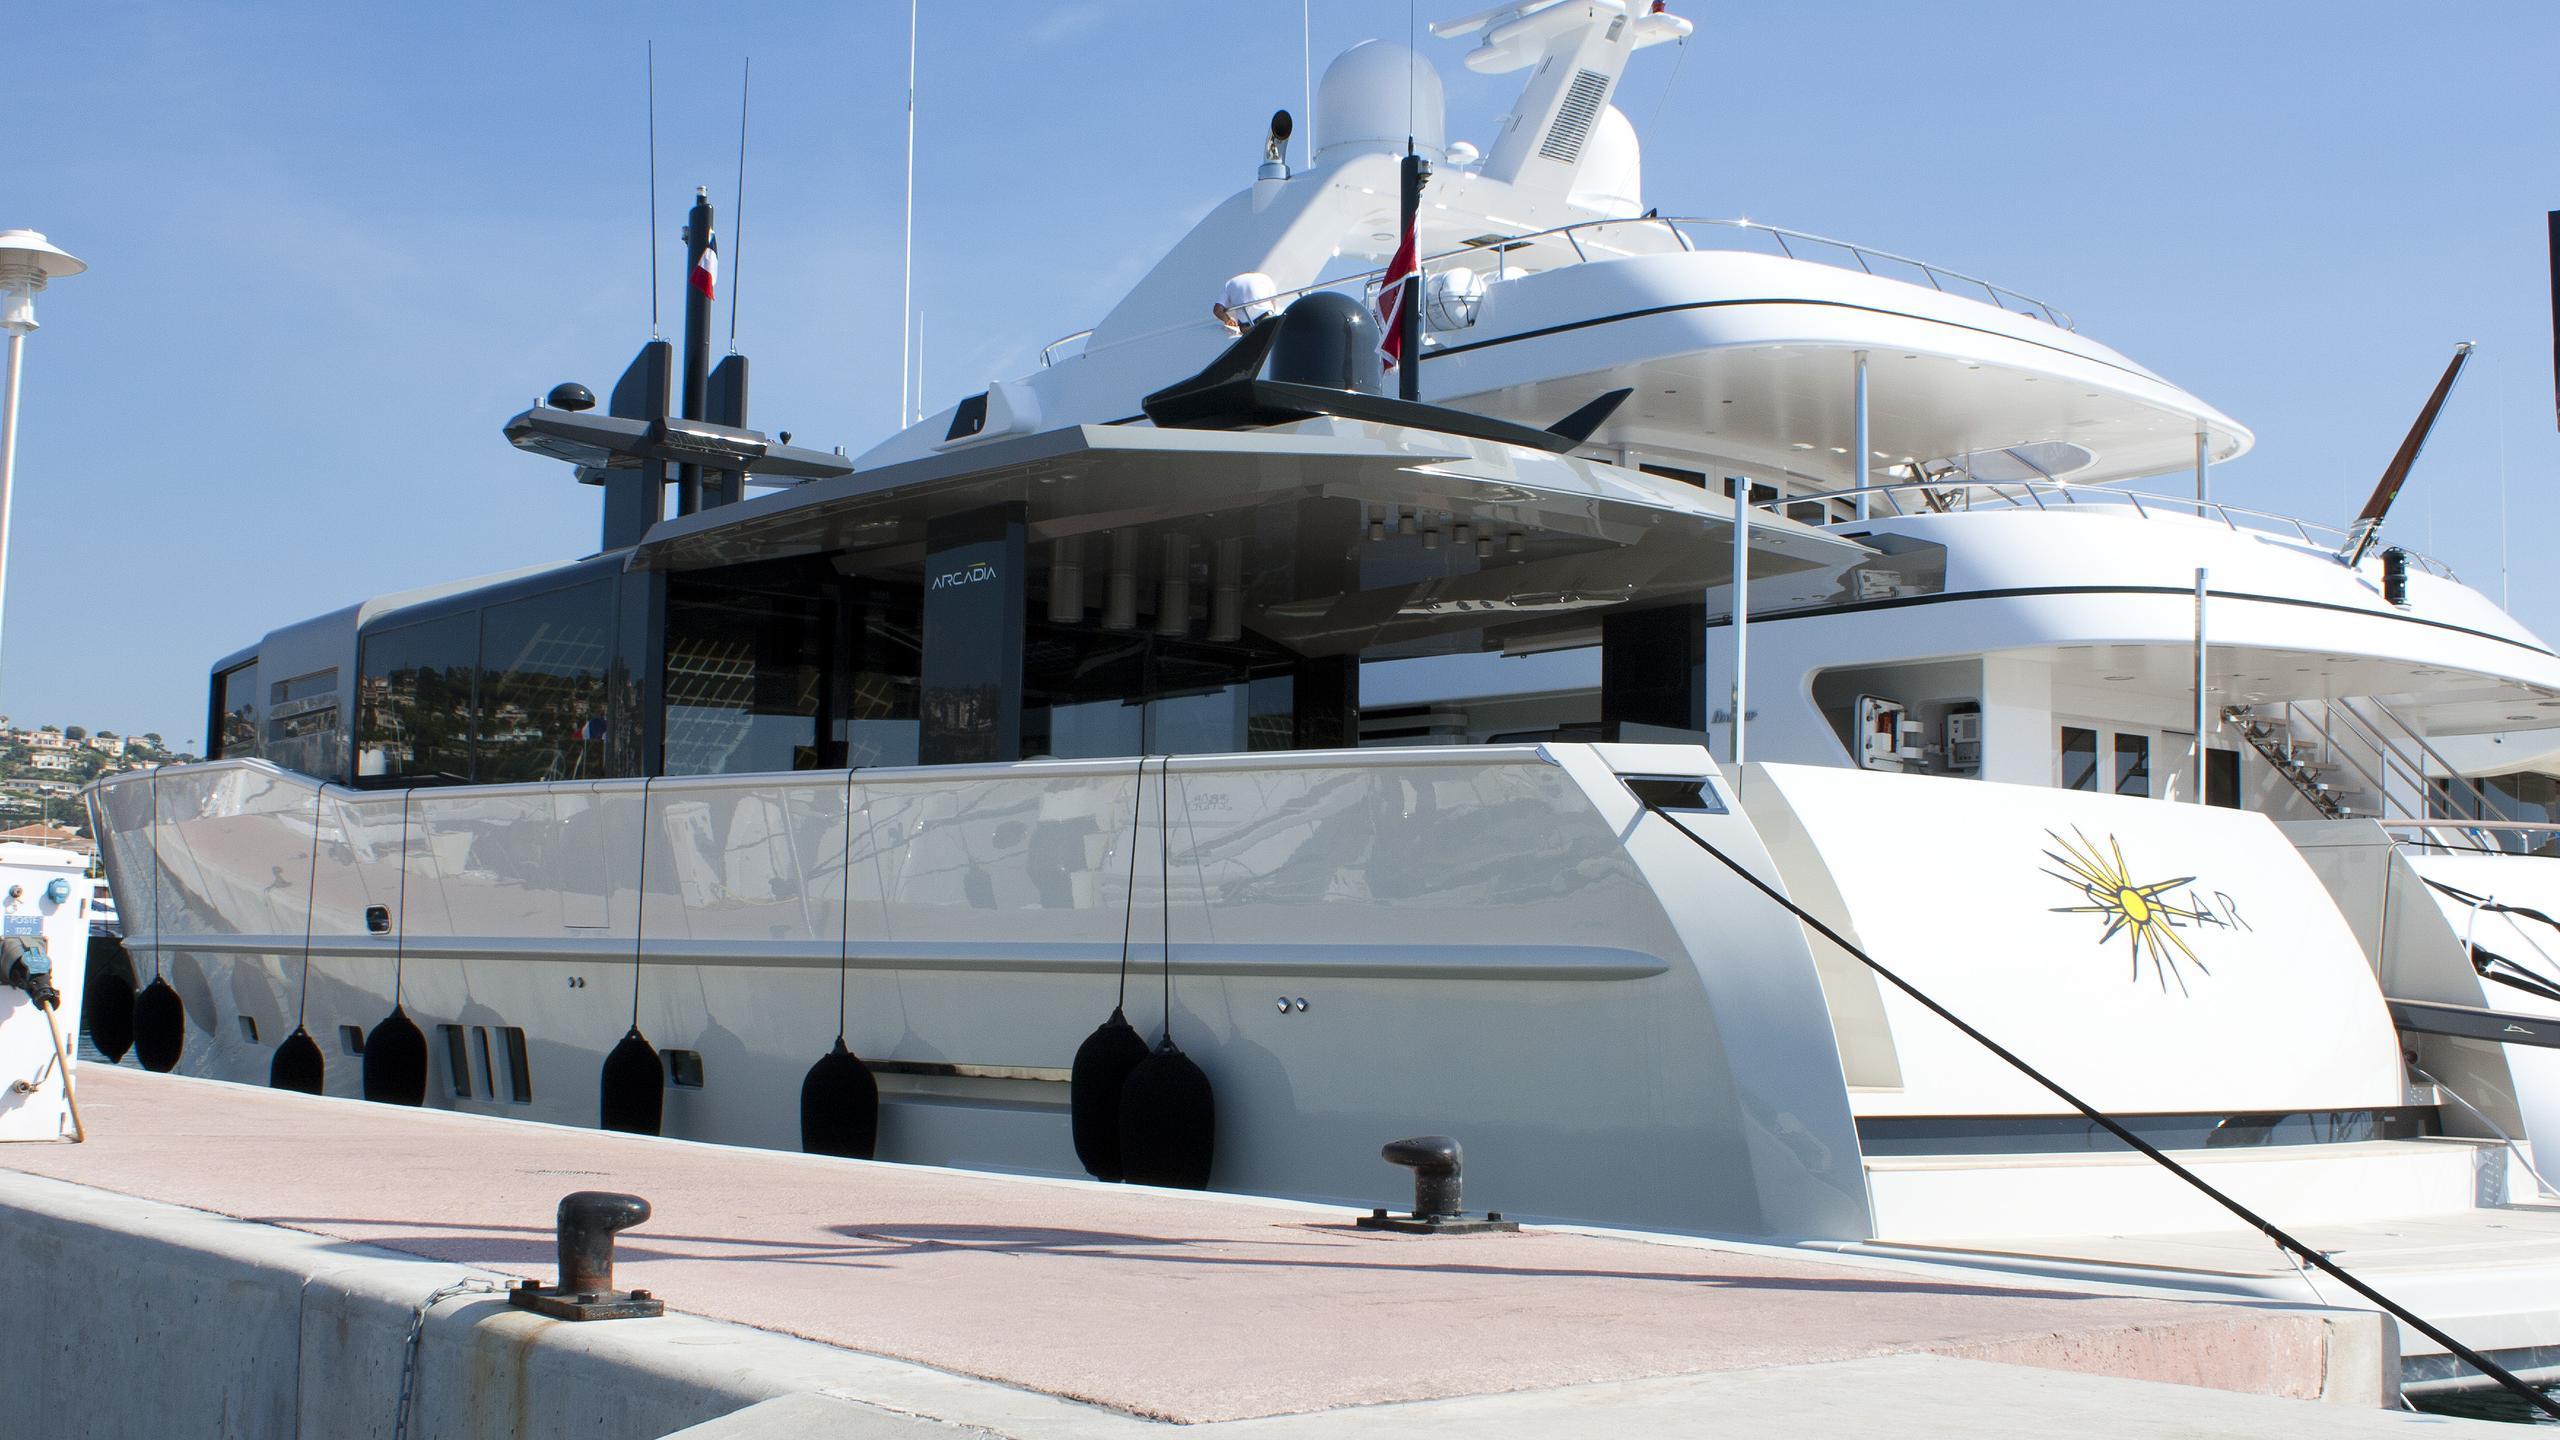 good-life-motor-yacht-arcadia-85-2010-26m-half-profile